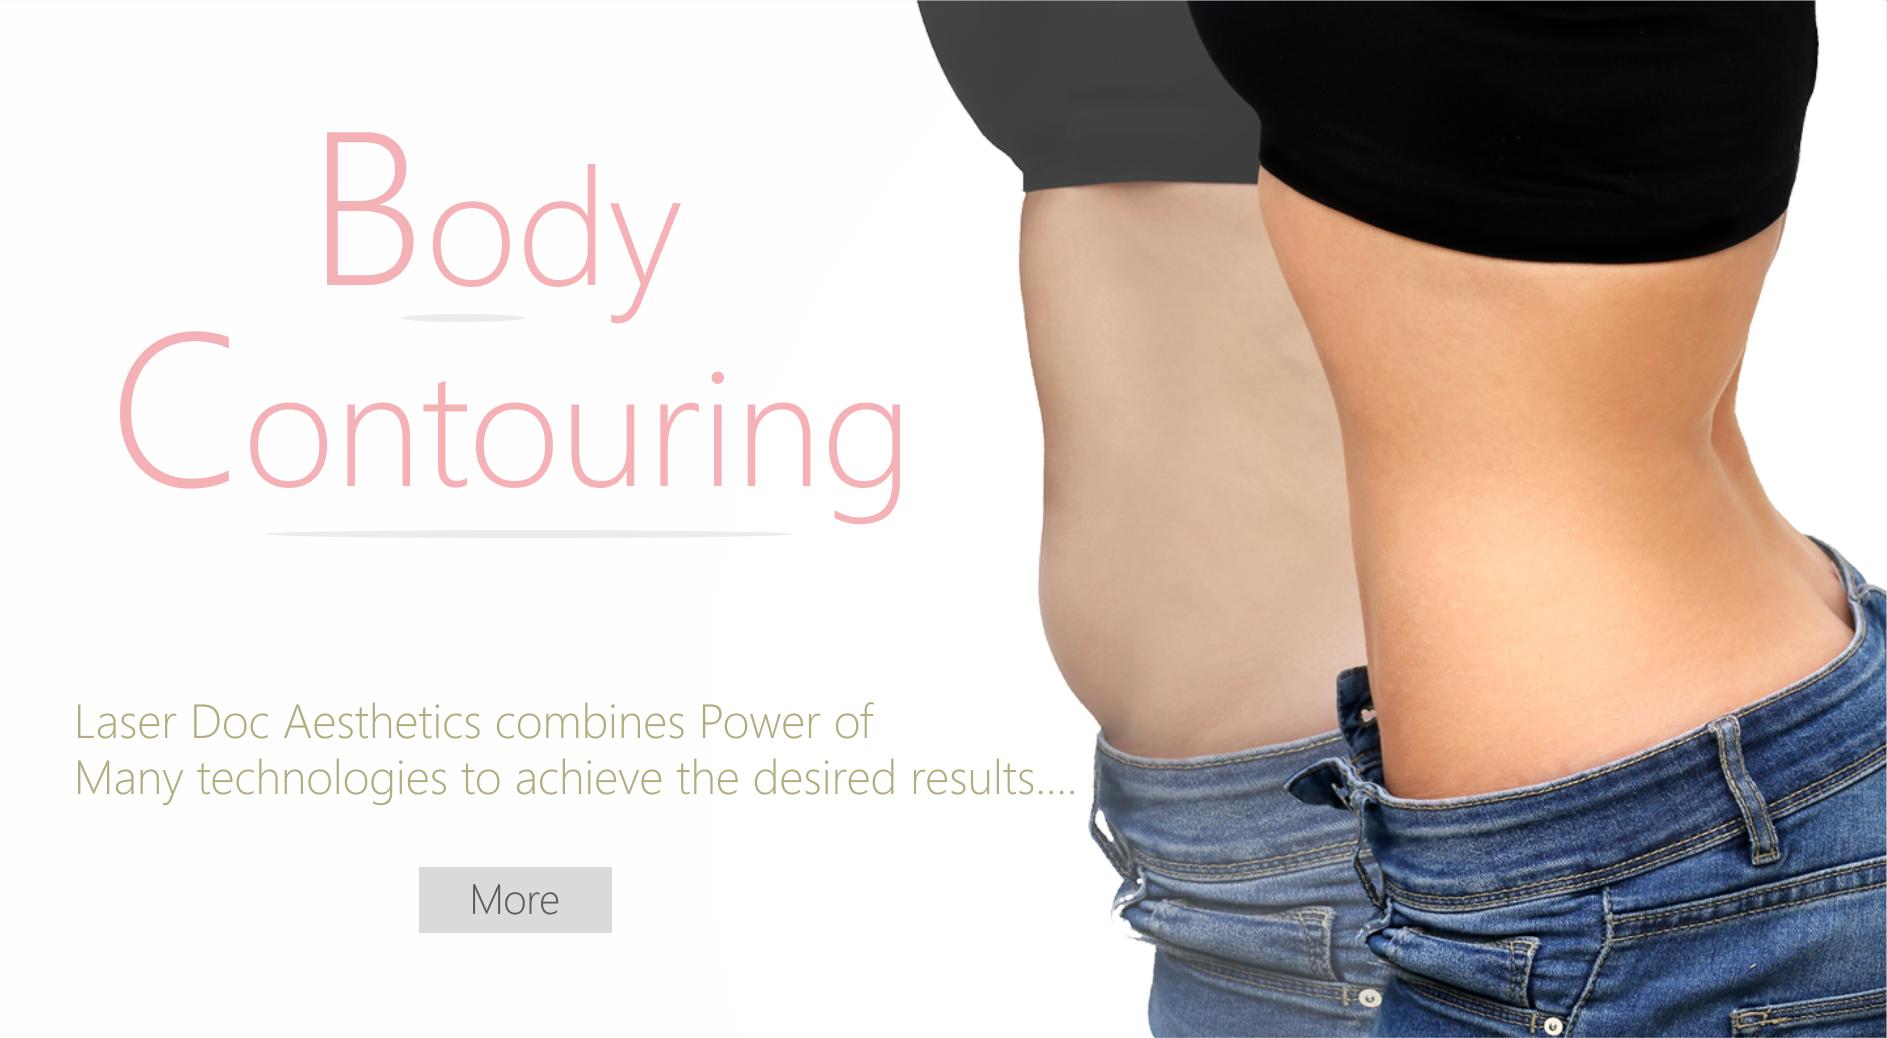 Body Contouring